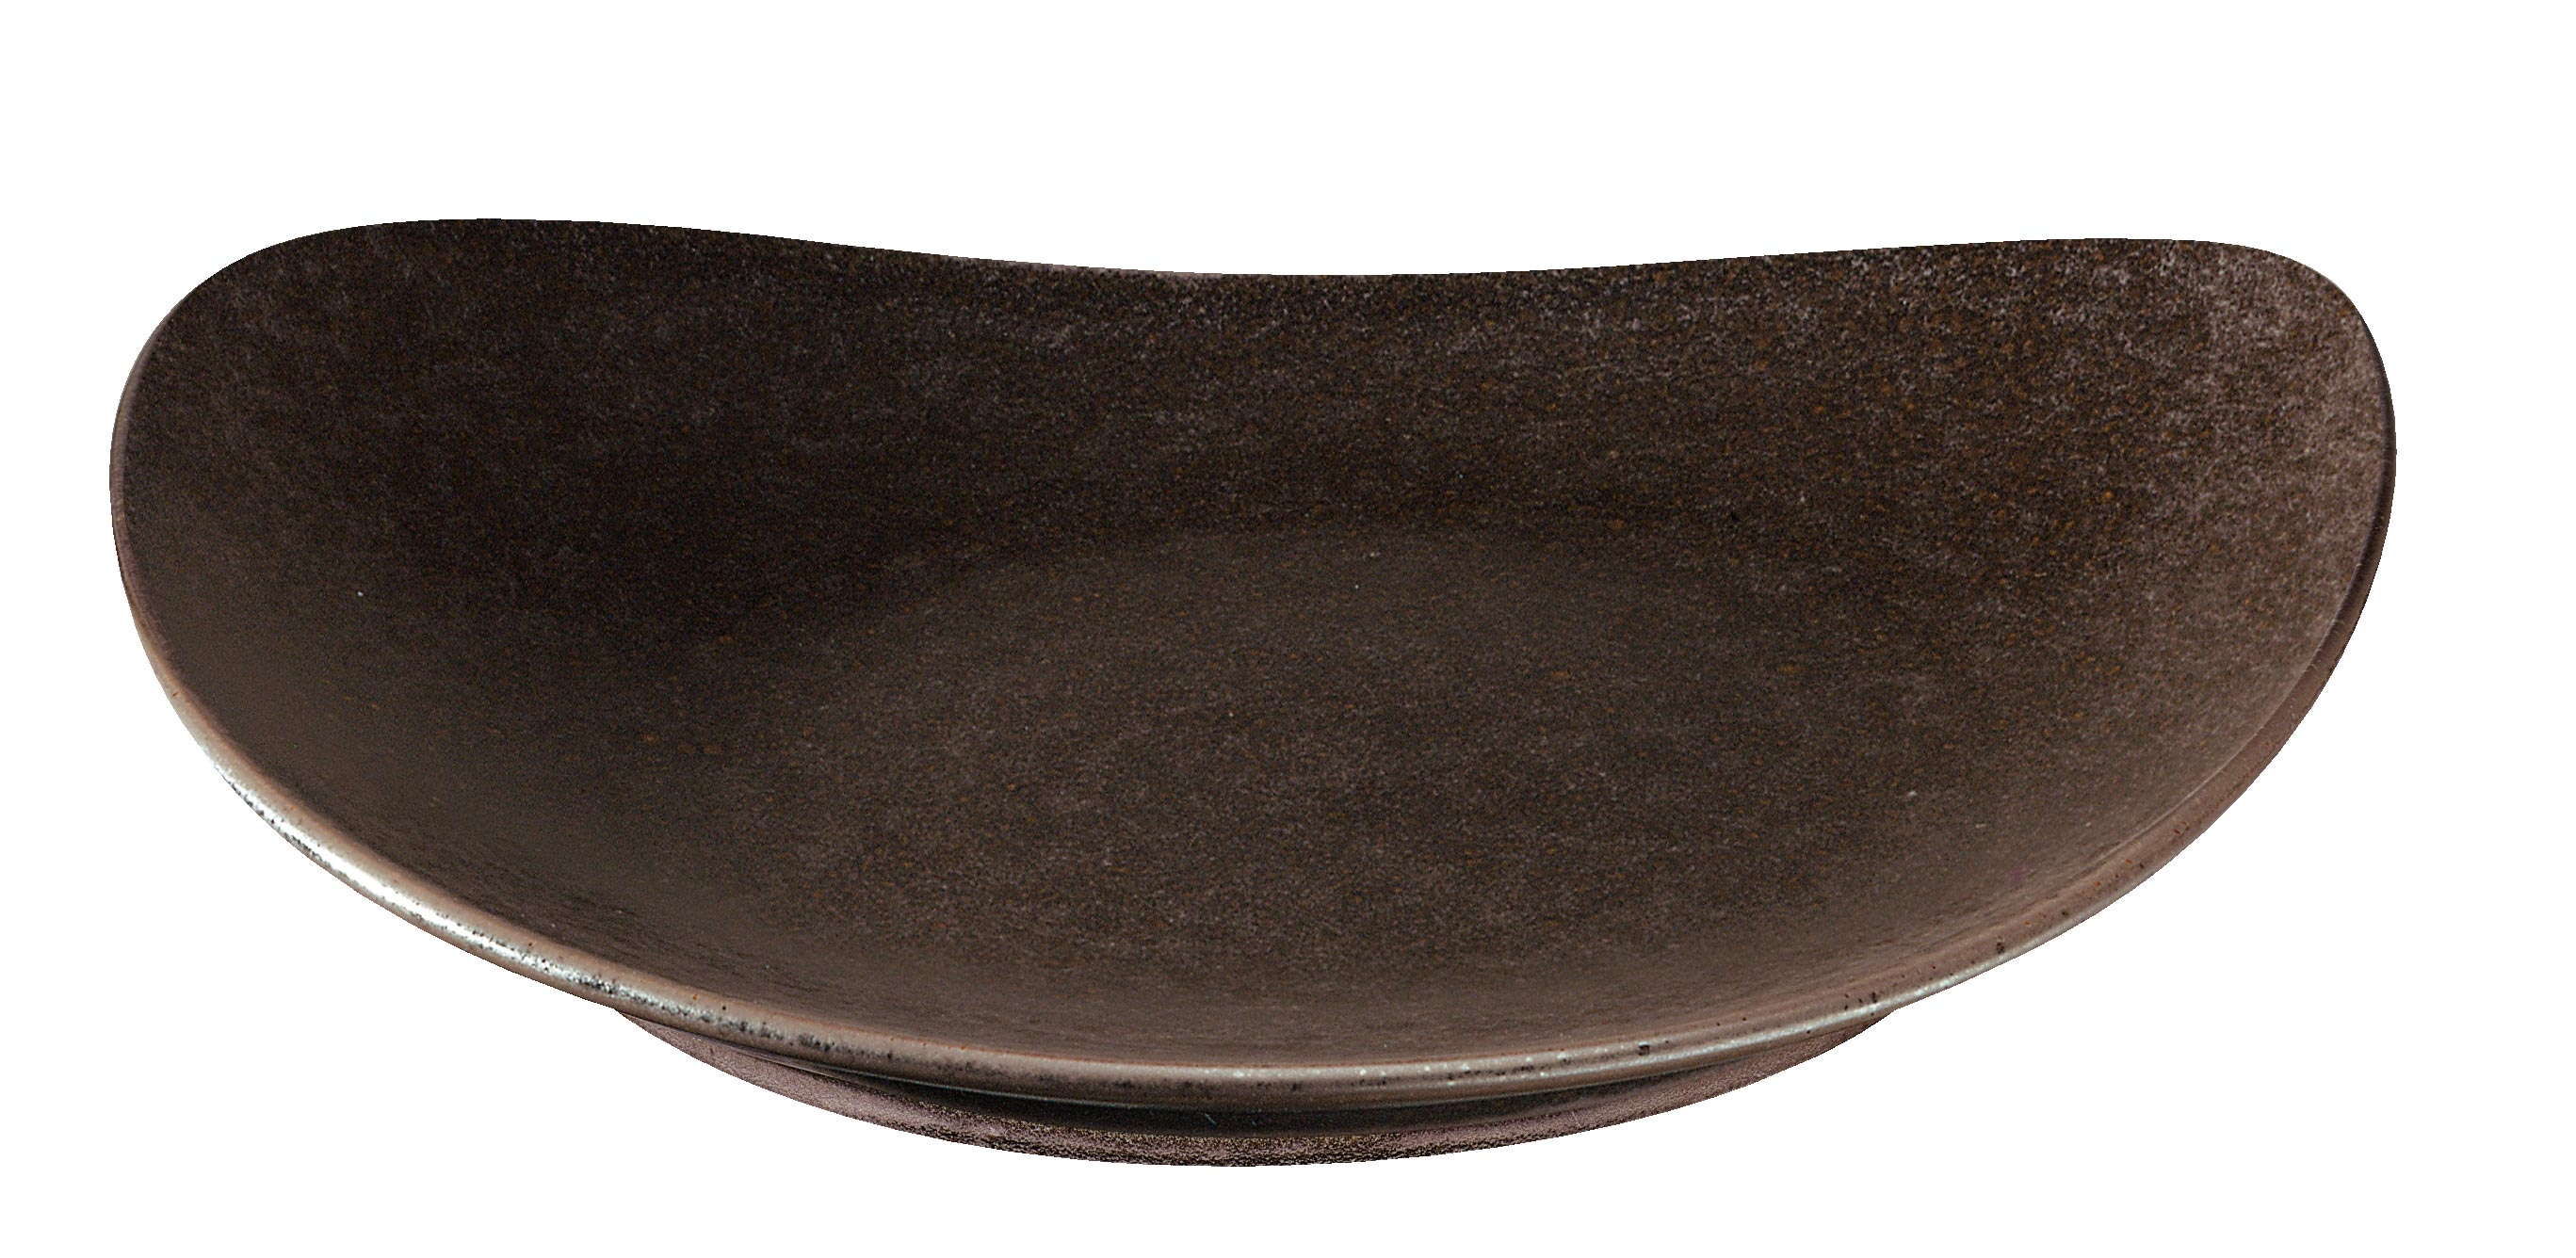 gourmetteller braun home by asa die asa selection wohnwelten. Black Bedroom Furniture Sets. Home Design Ideas